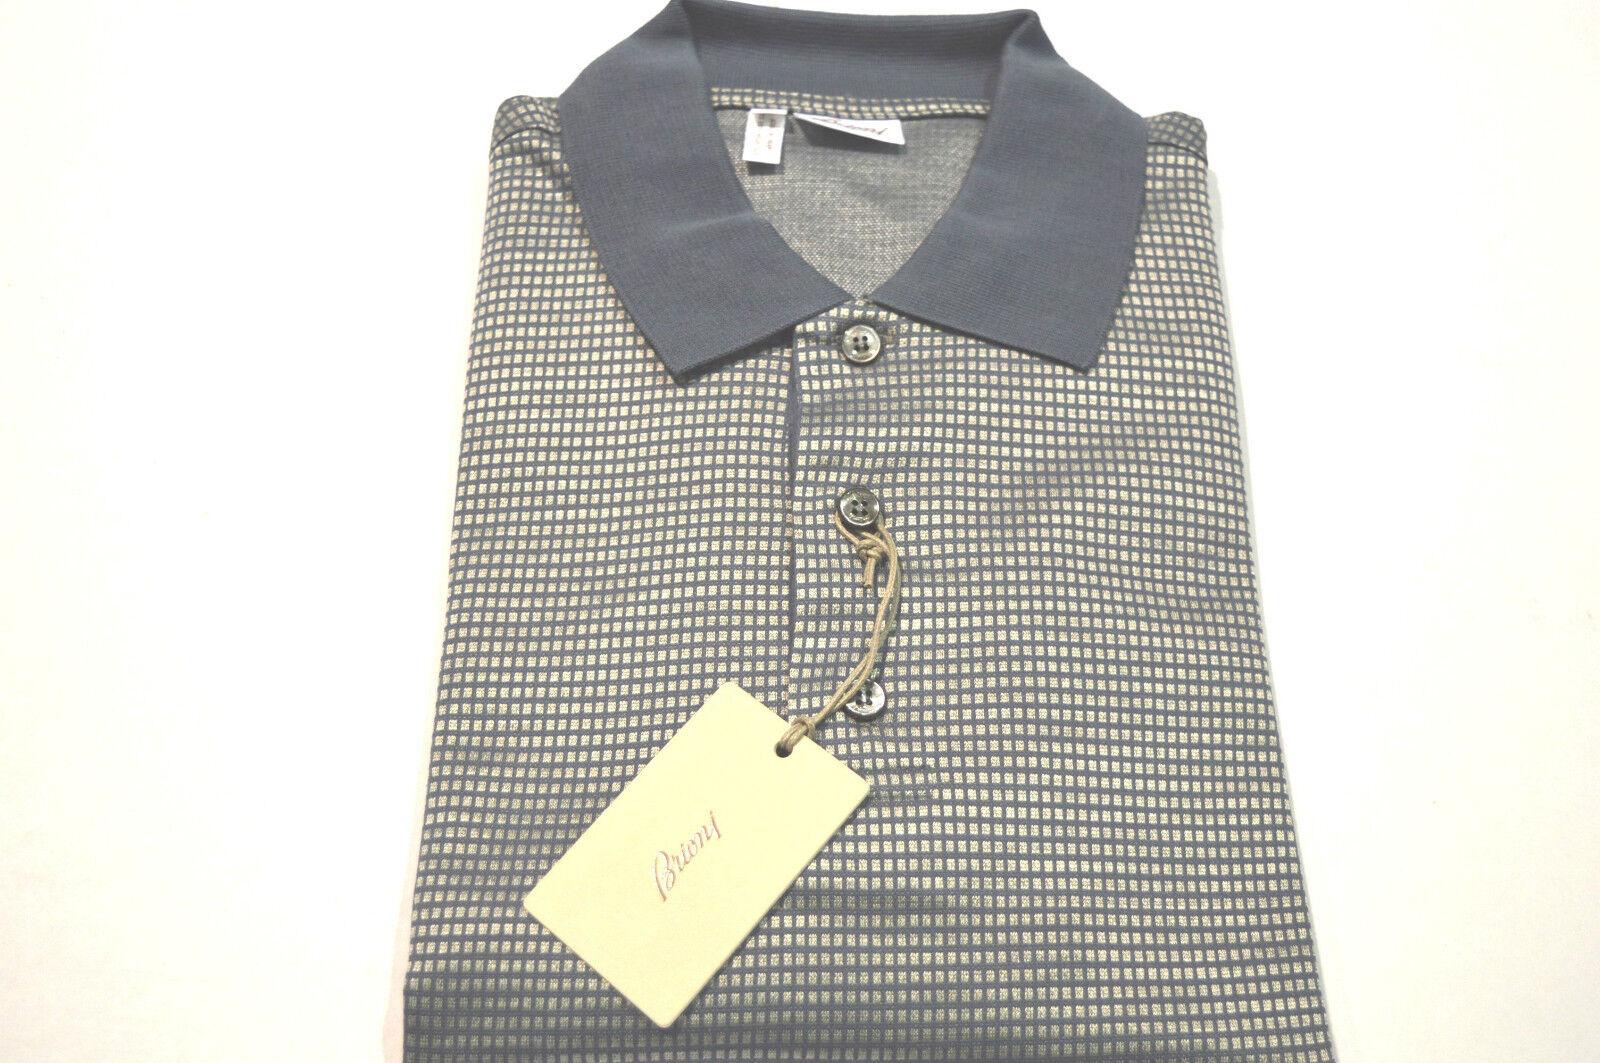 NEW  BRIONI Polo  Short Sleeve  57% Cotton  43%Silk Größe XL Us Eu 54 (SpquadrC)